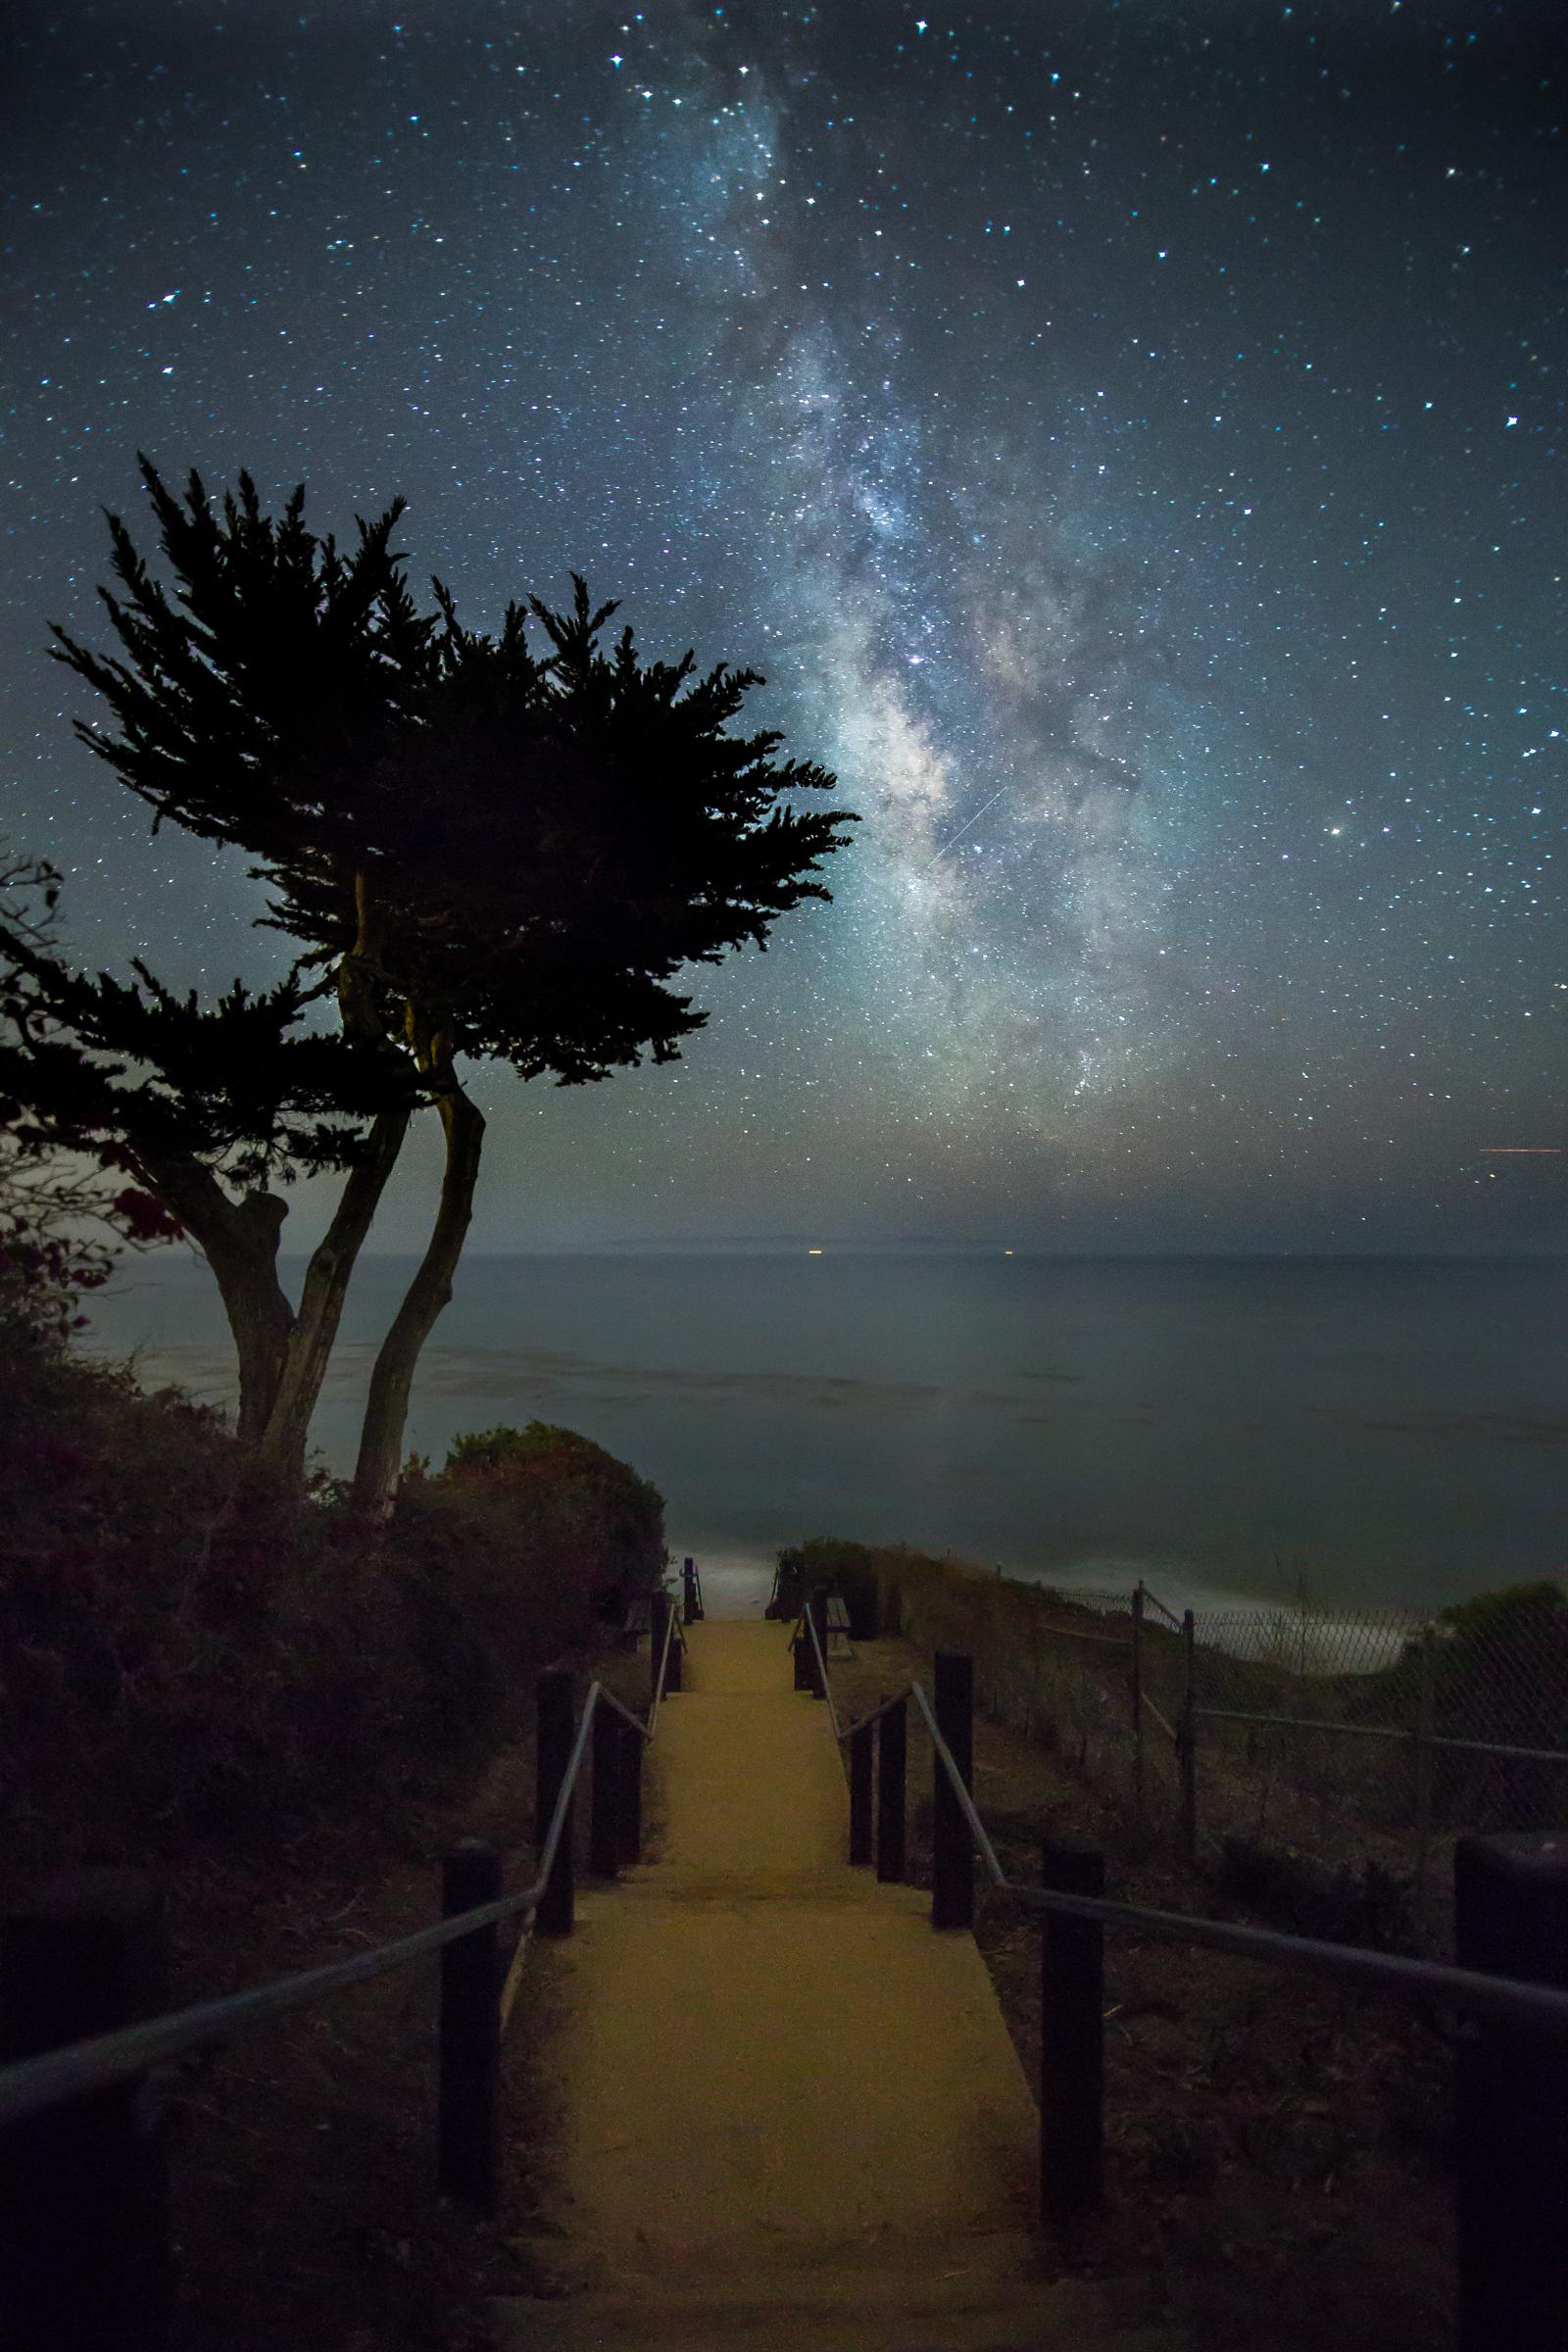 DW_AstroPhoto001.jpg